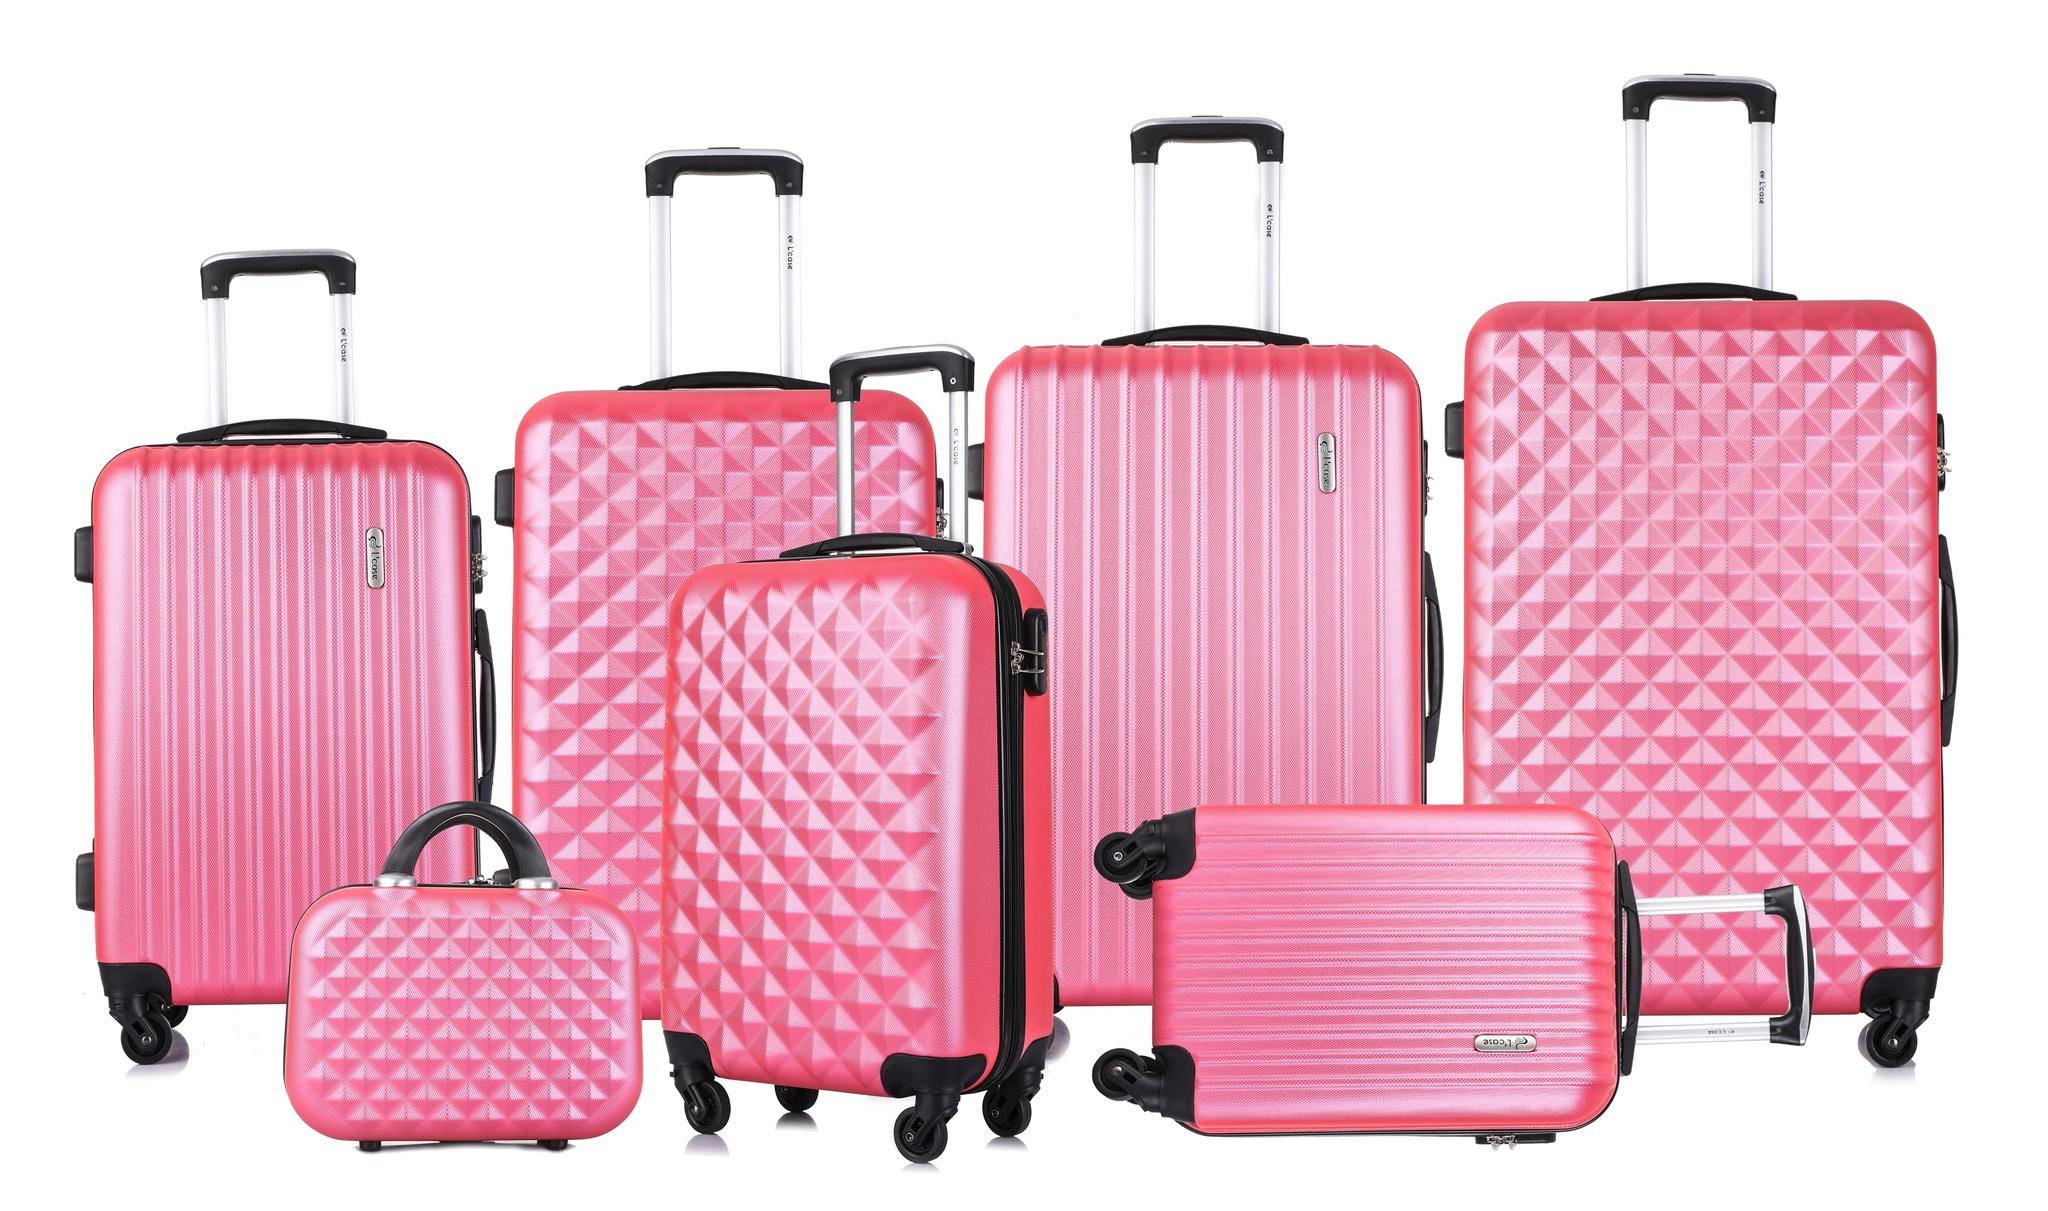 Чемодан со съемными колесами L'case Phatthaya-24 Розовый (M)